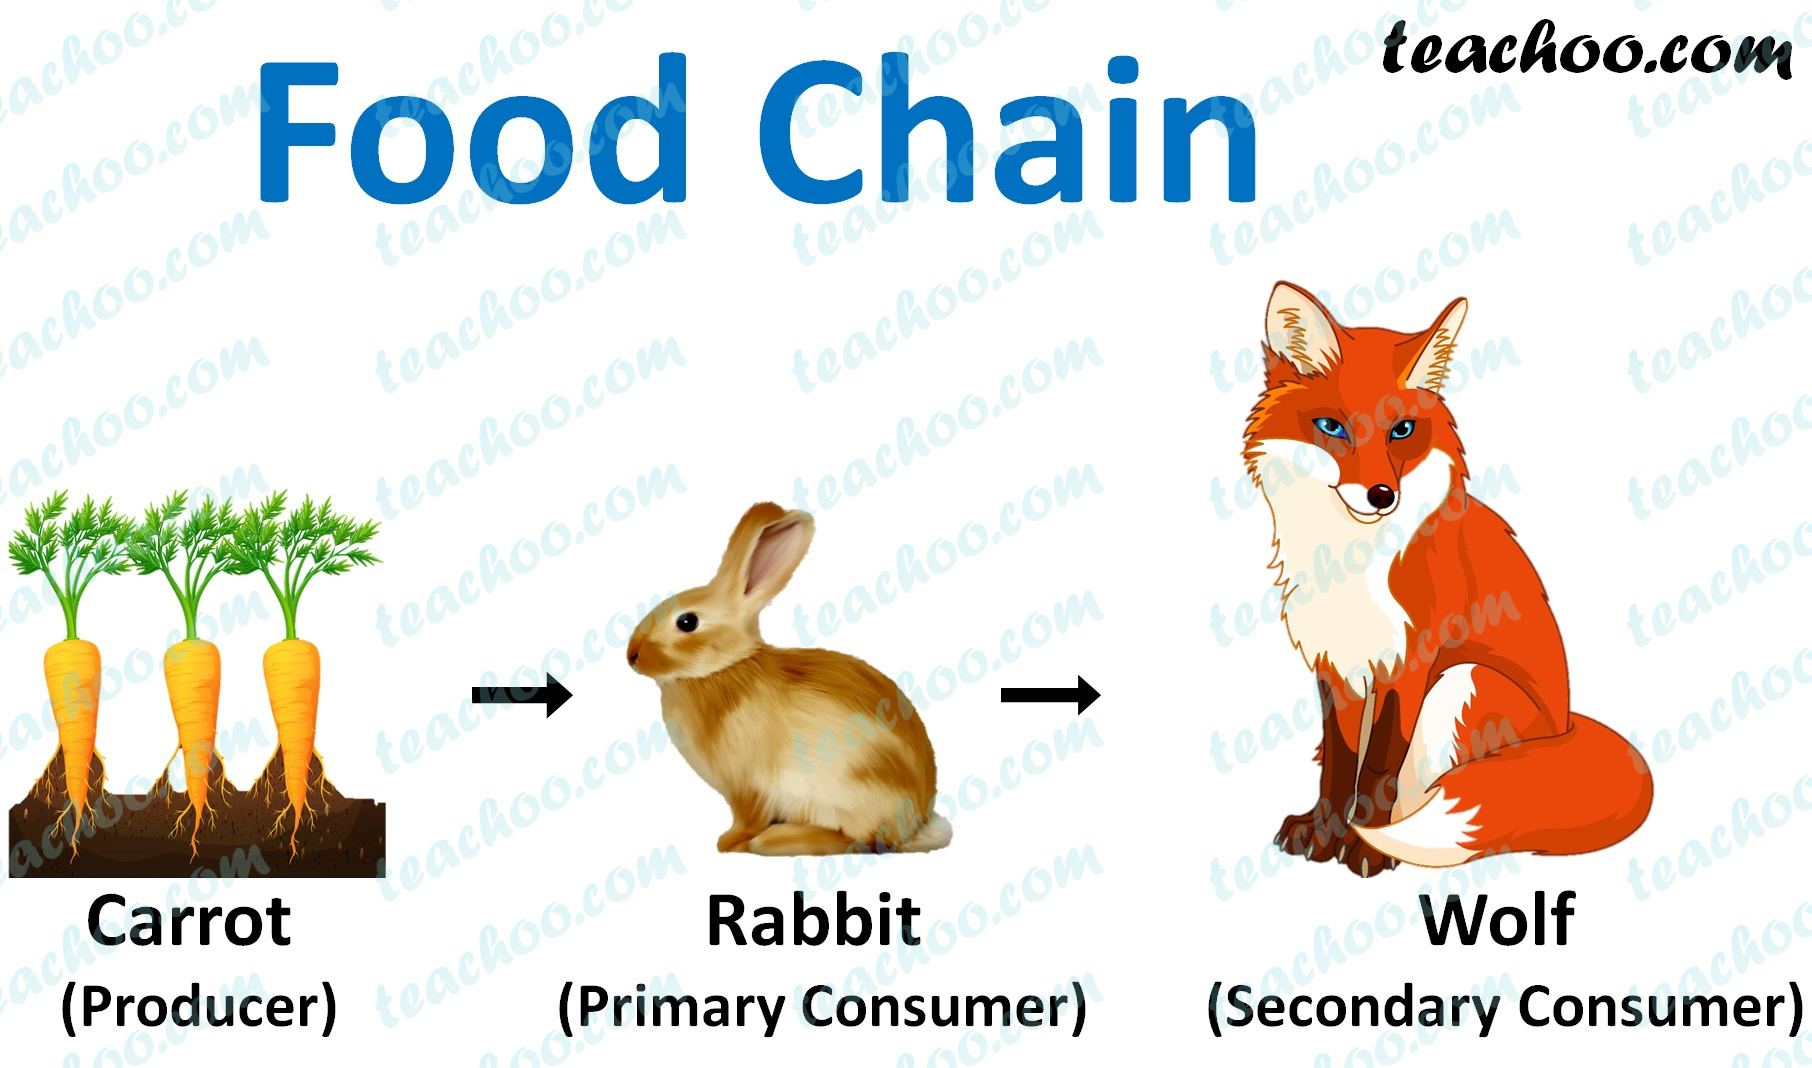 food-chain-ncert-q4---teachoo (1).jpg